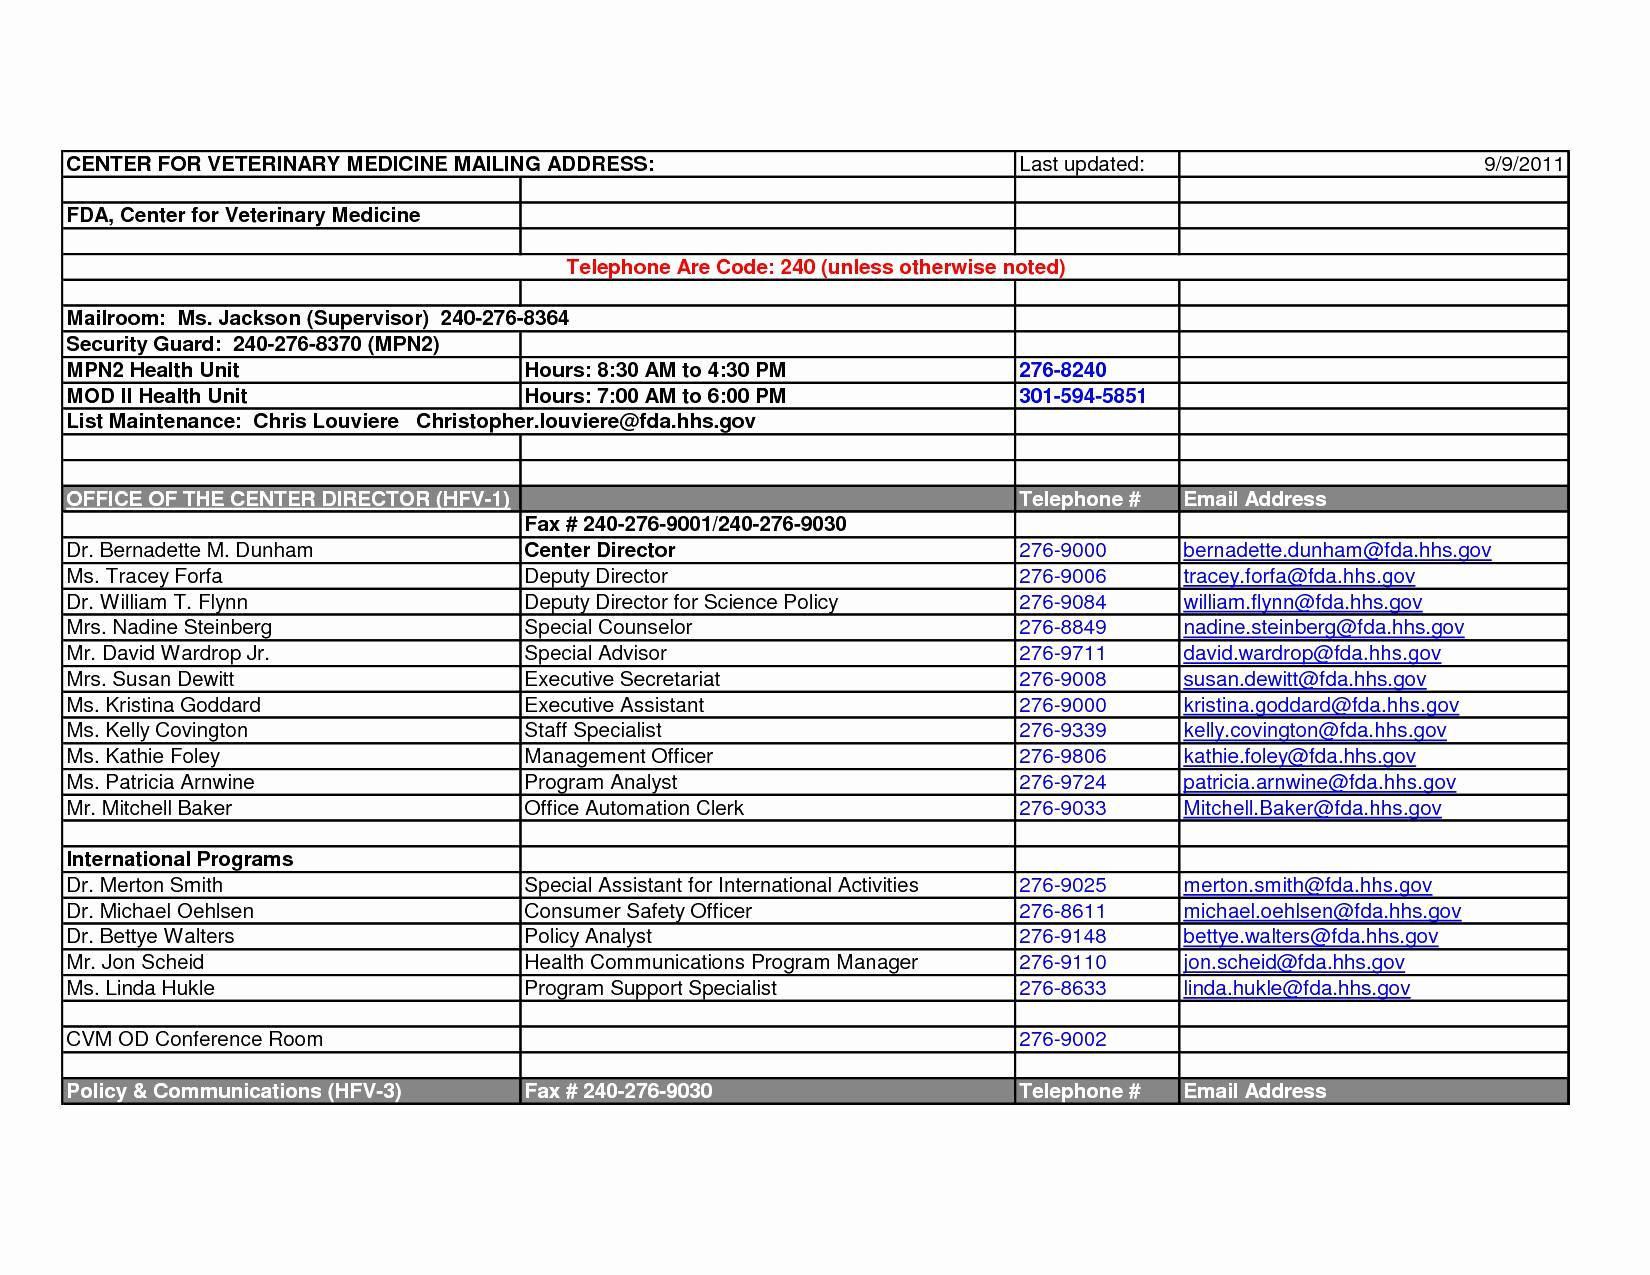 Geocode Excel Spreadsheet Intended For Geocode Spreadsheet